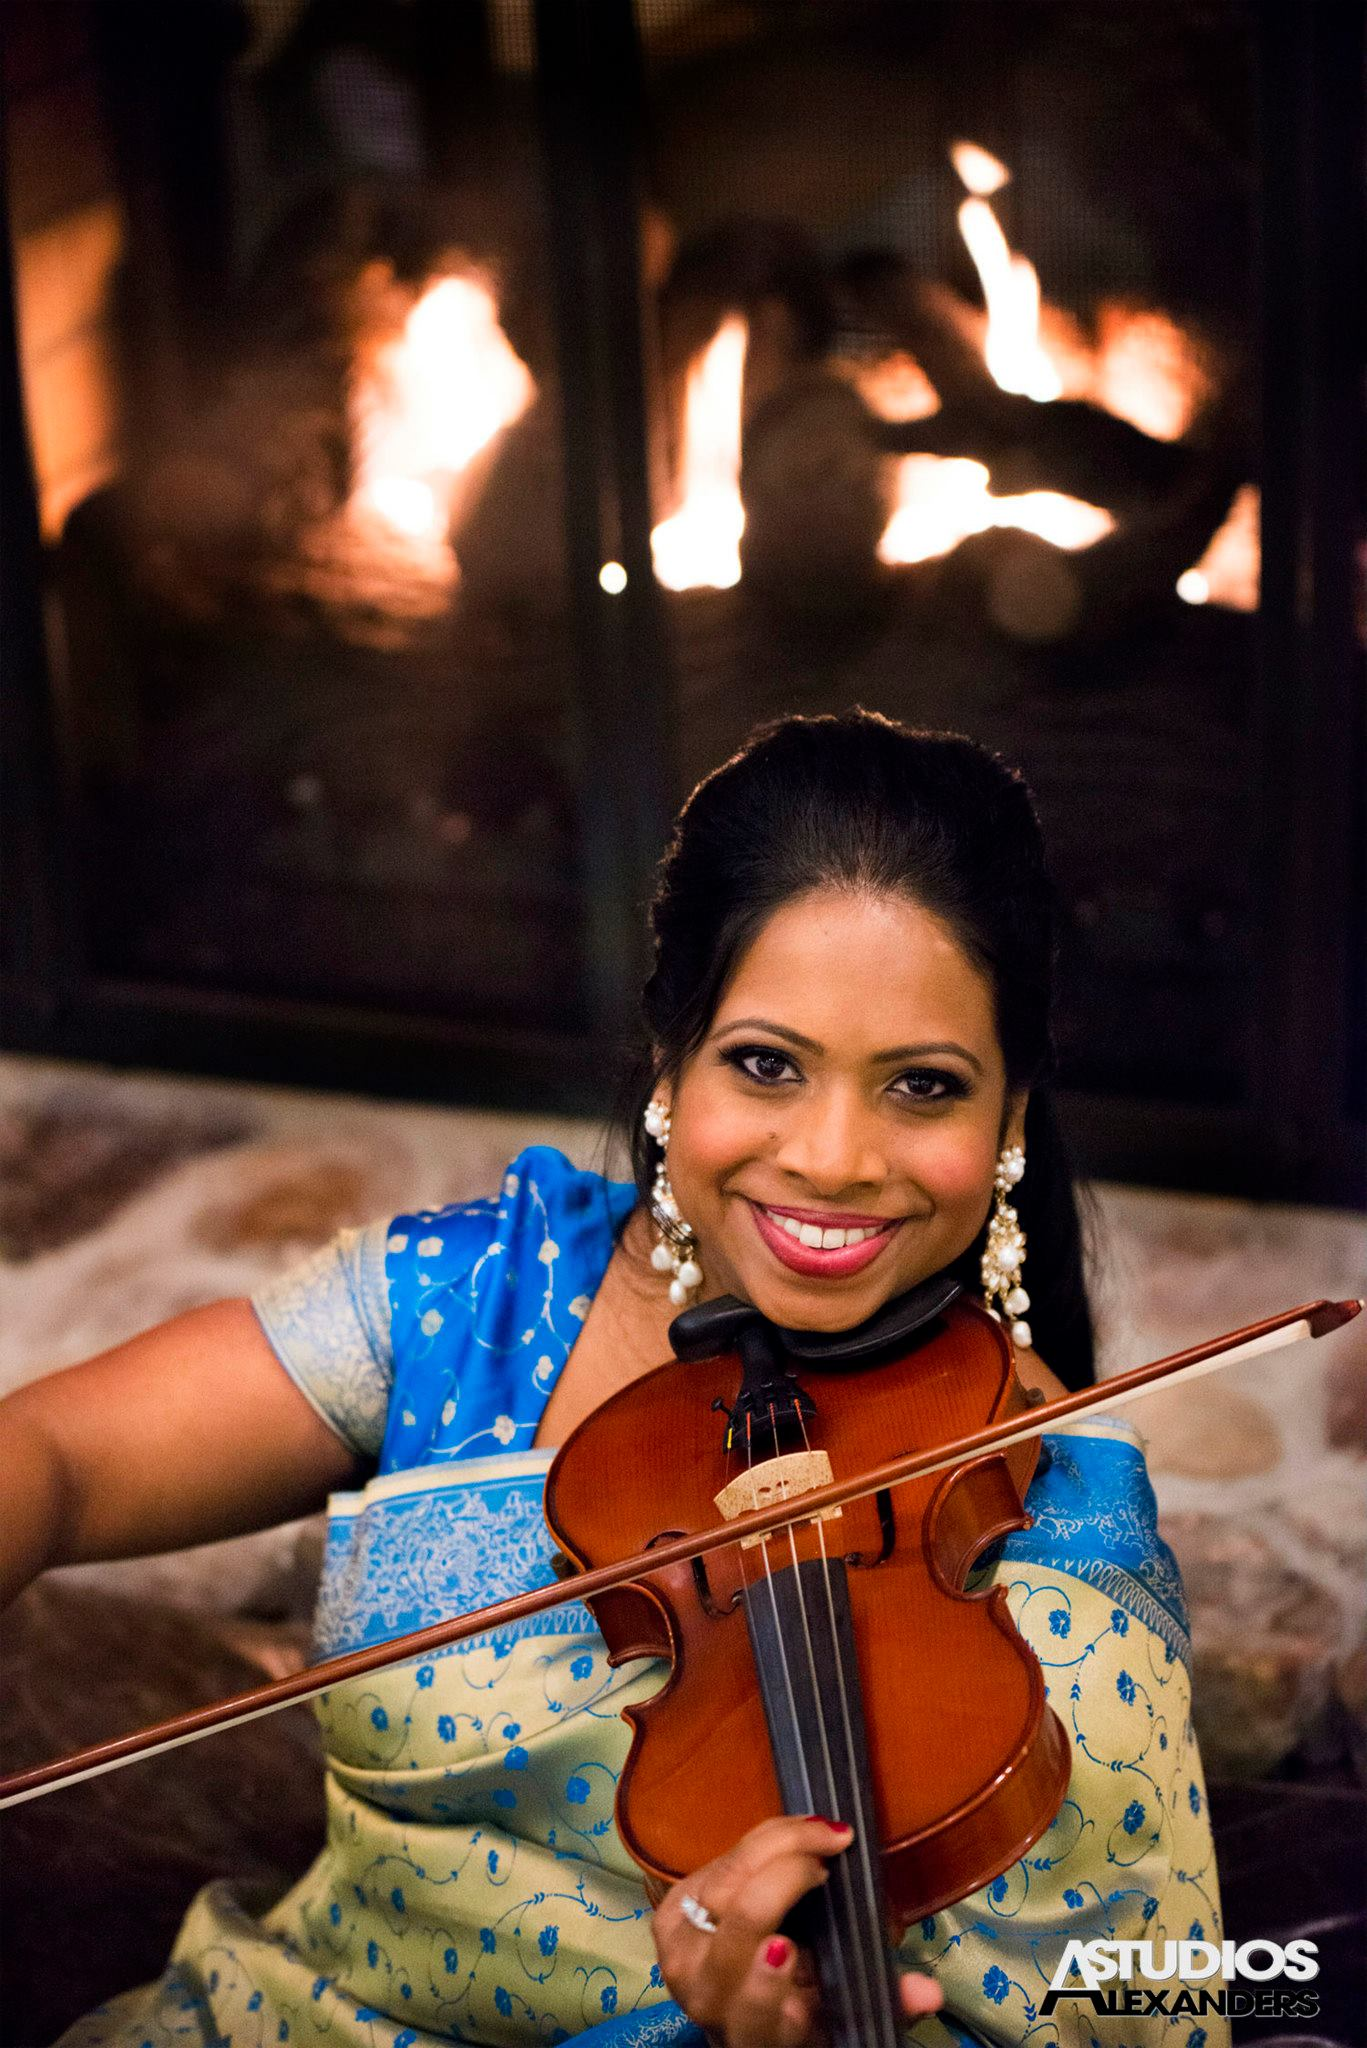 Alexanders Studios - Udeshi Hargett Violinist - Wedding Hair by Liz Perniciaro